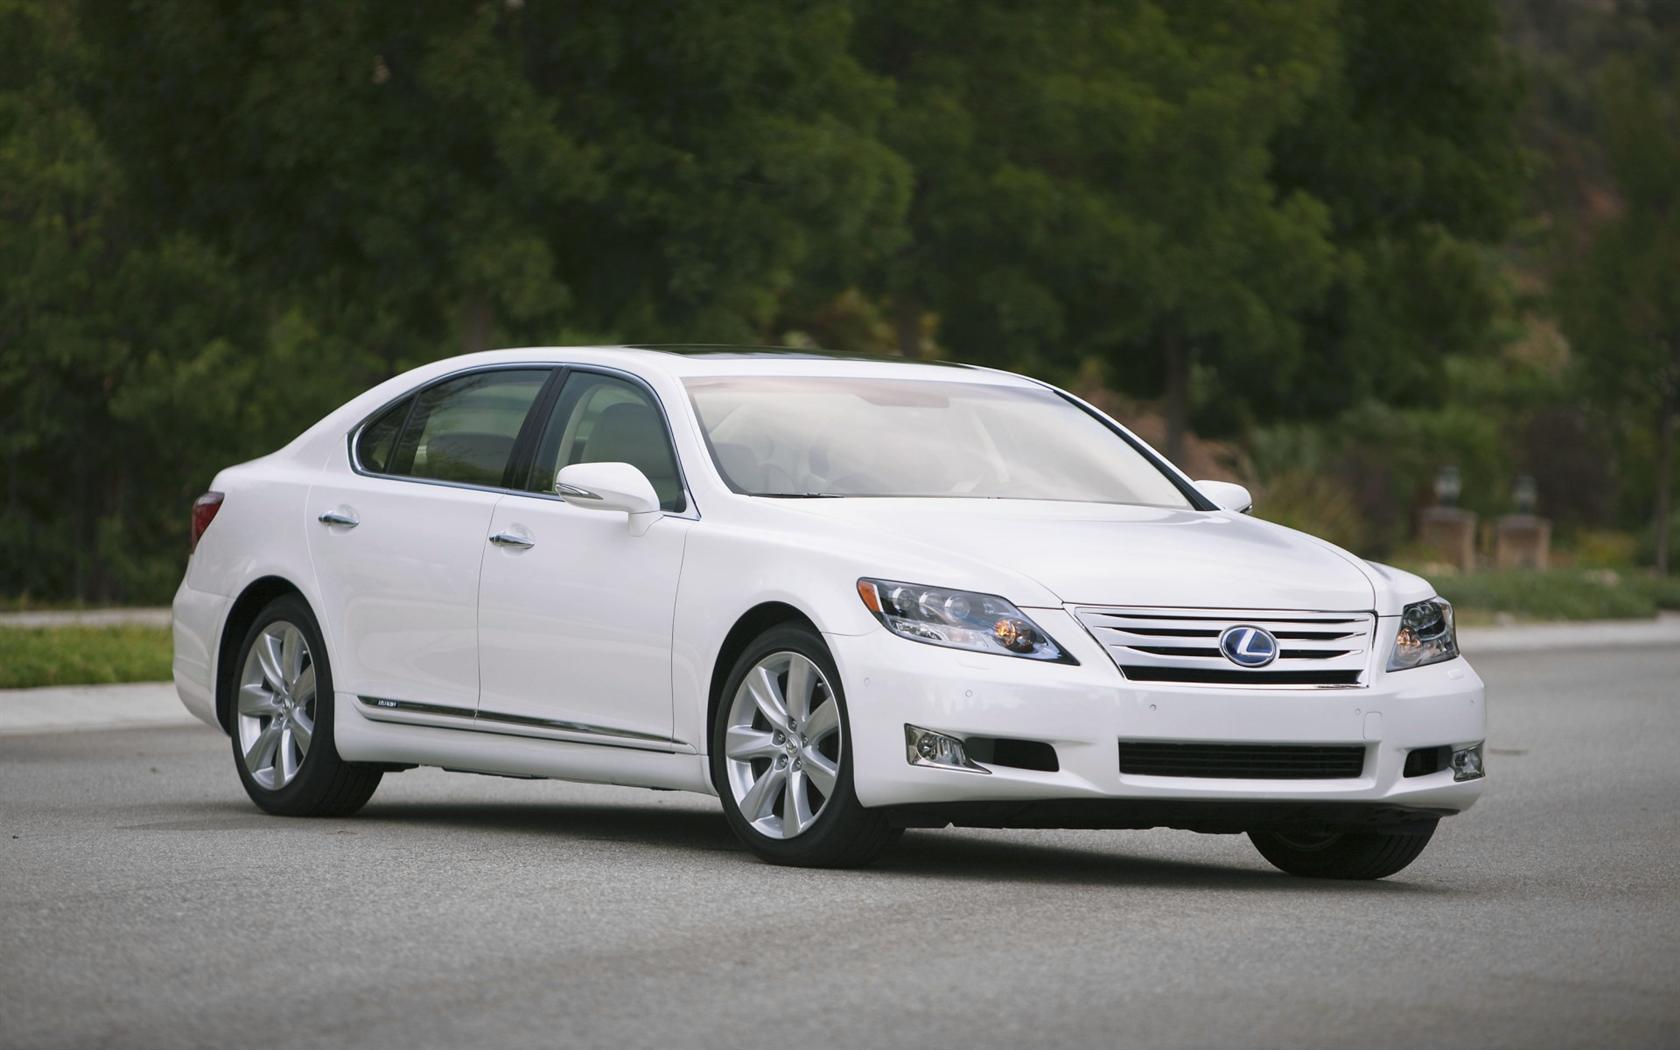 https://www.conceptcarz.com/images/Lexus/2011_Lexus-LS-600h_L_Sedan-Image-09-1680.jpg